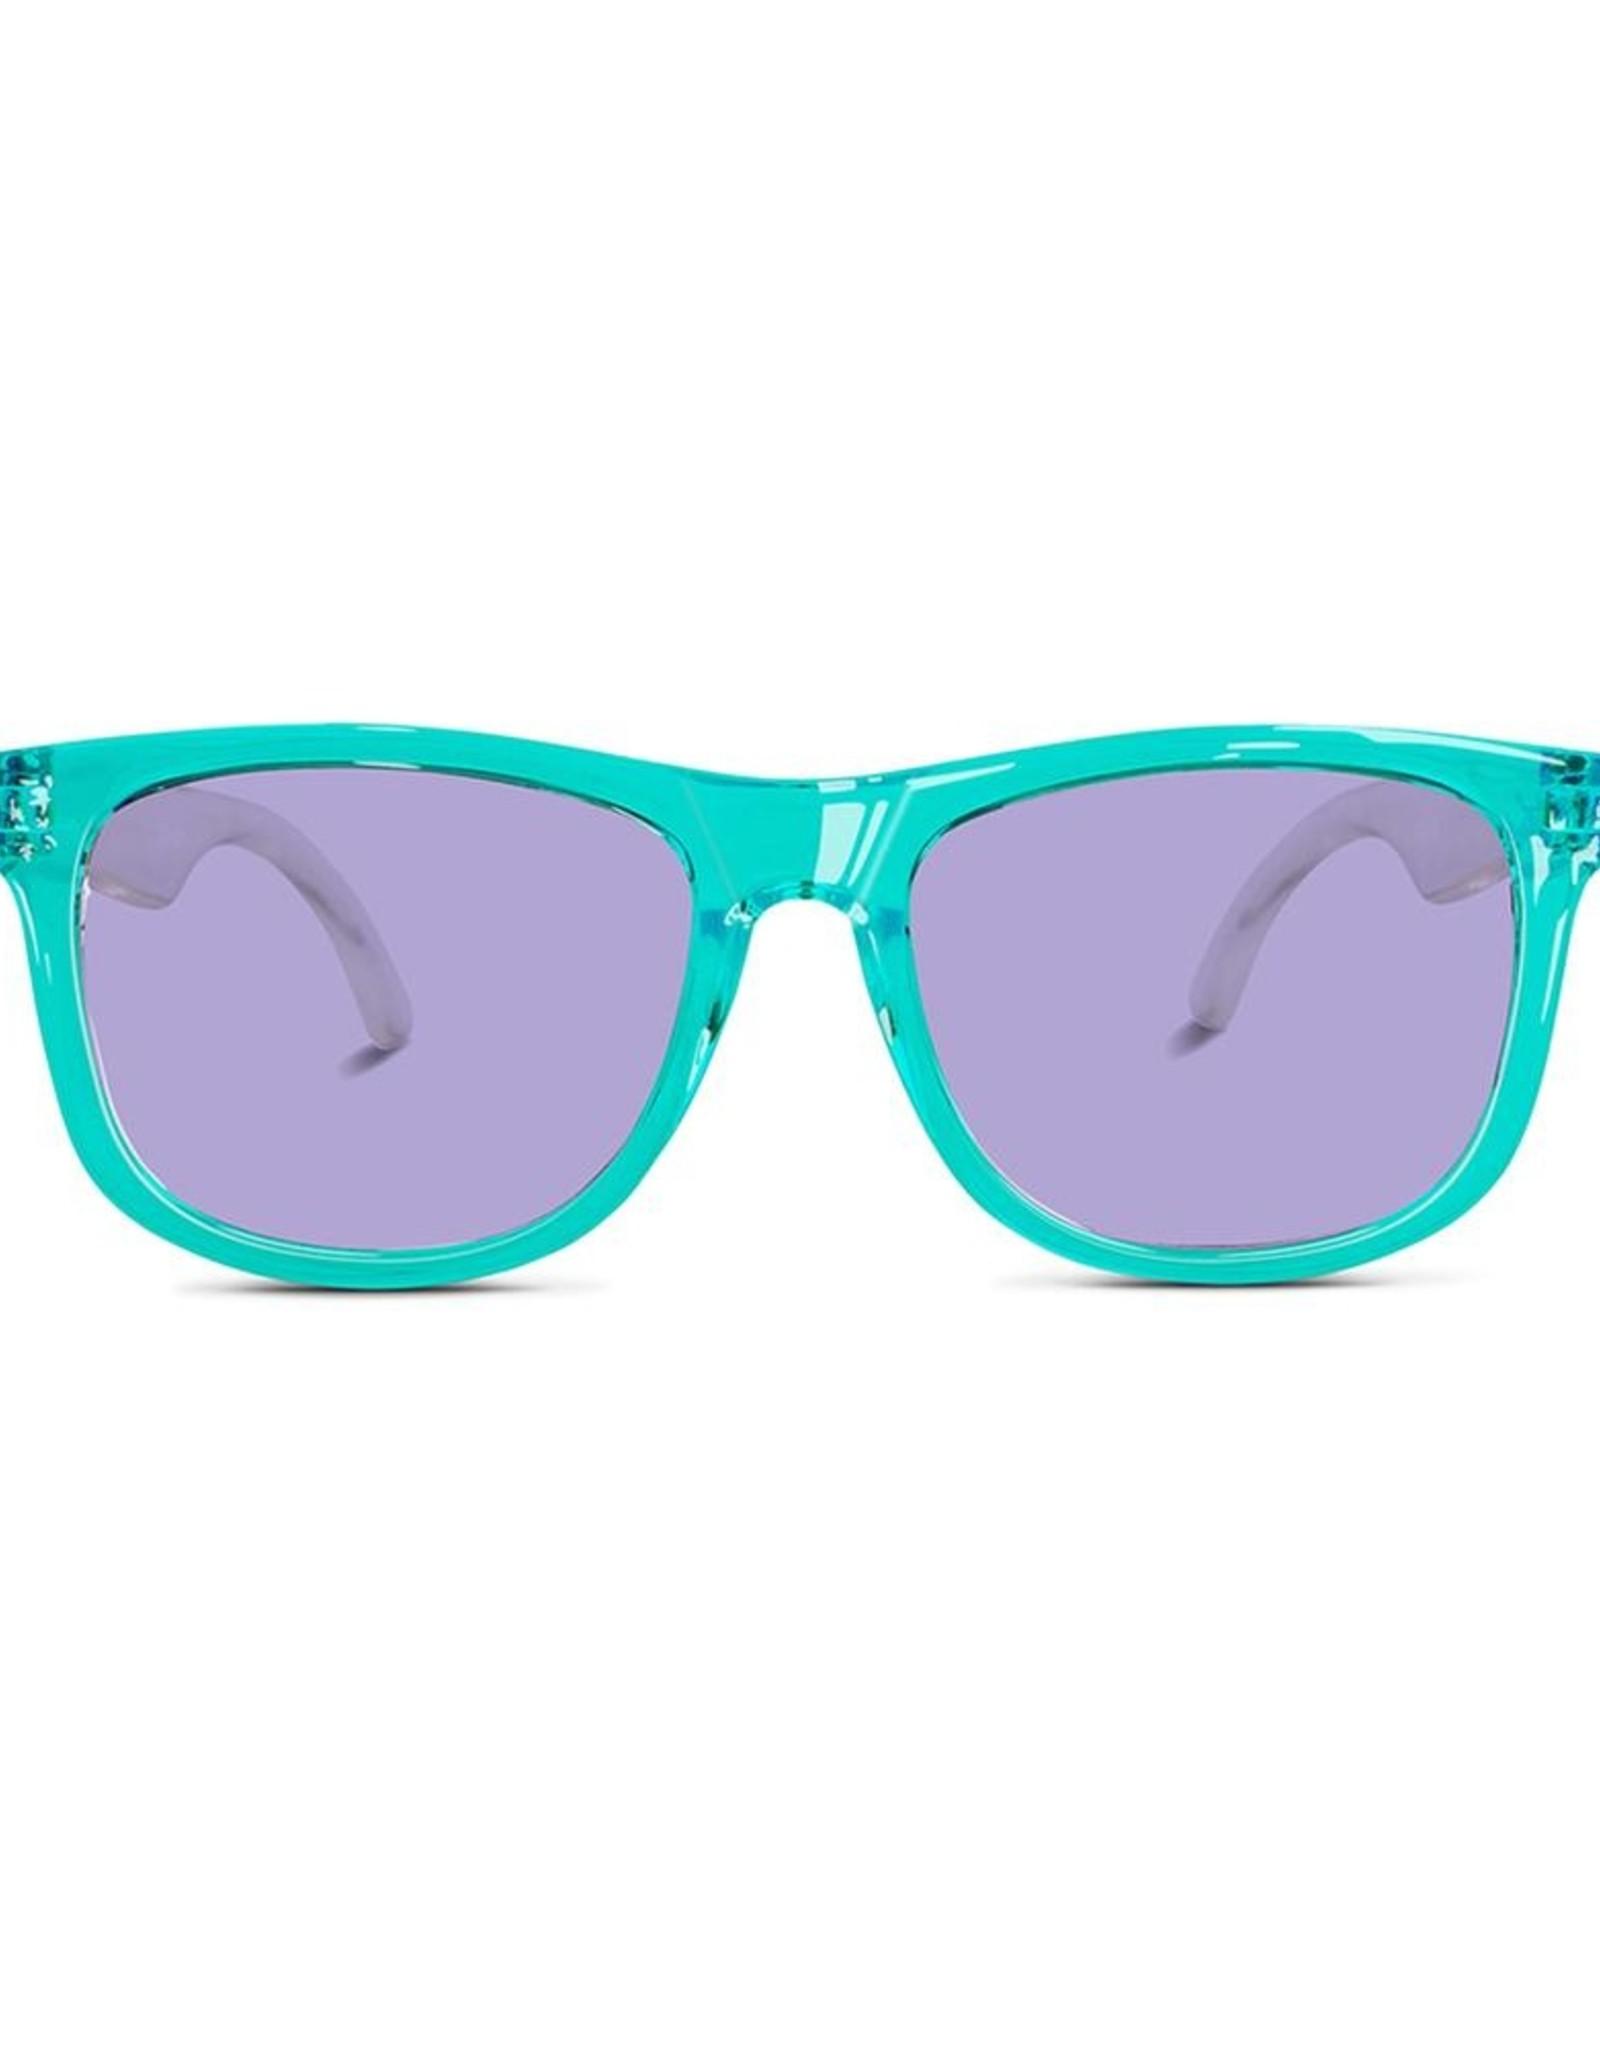 Hipsterkid Hipsterkid Wayfarers zonnebril aqua / orchid